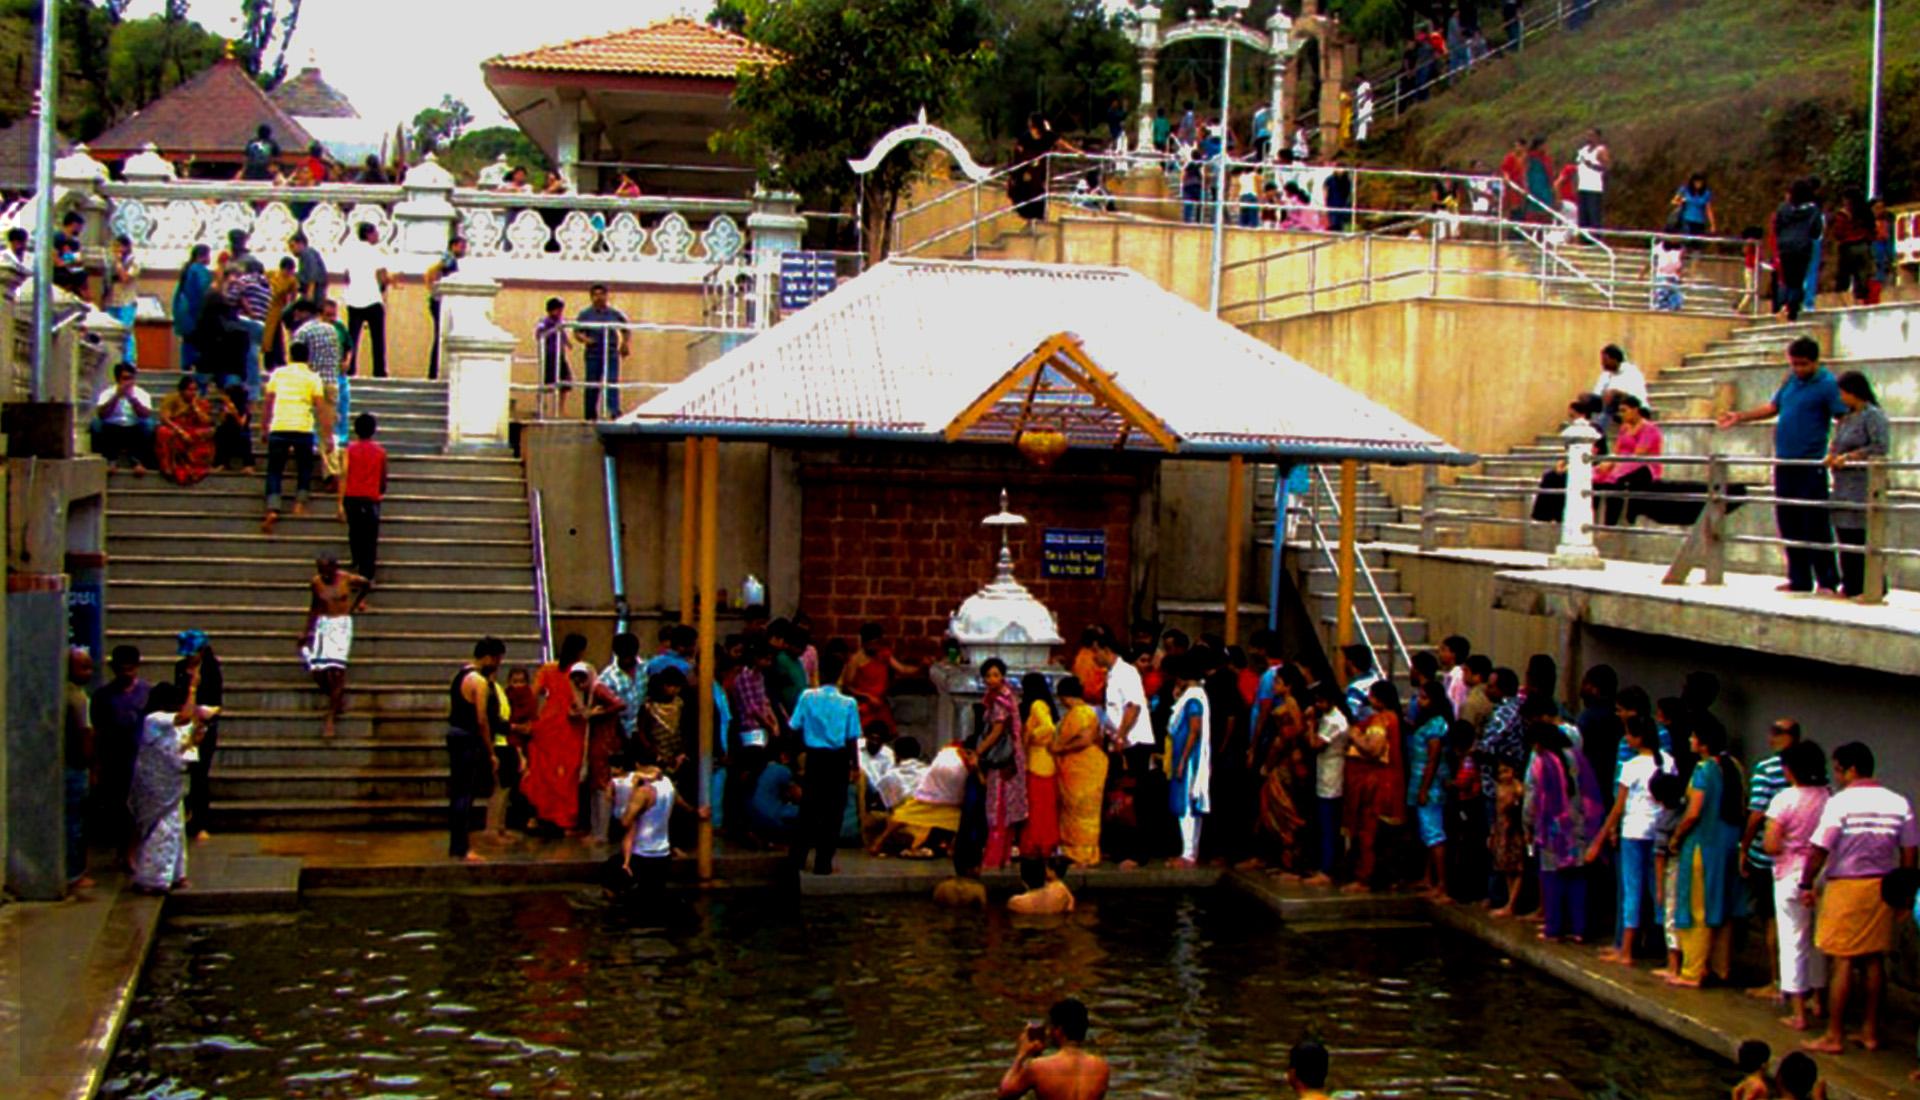 Cauvery-Sankramana-Coorg